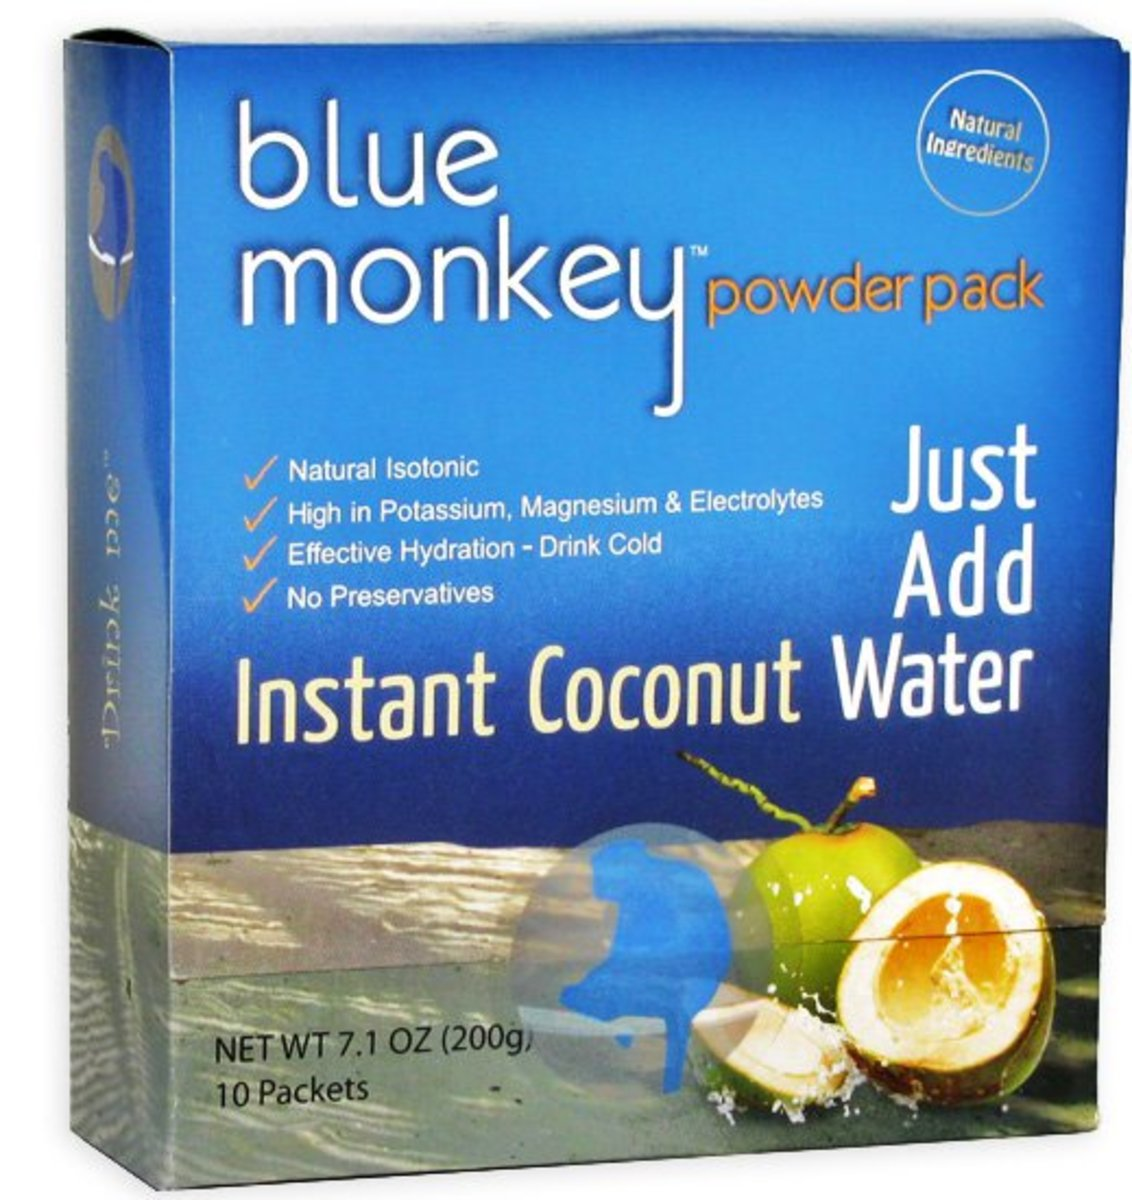 Blue Monkey Instant Coconut Water